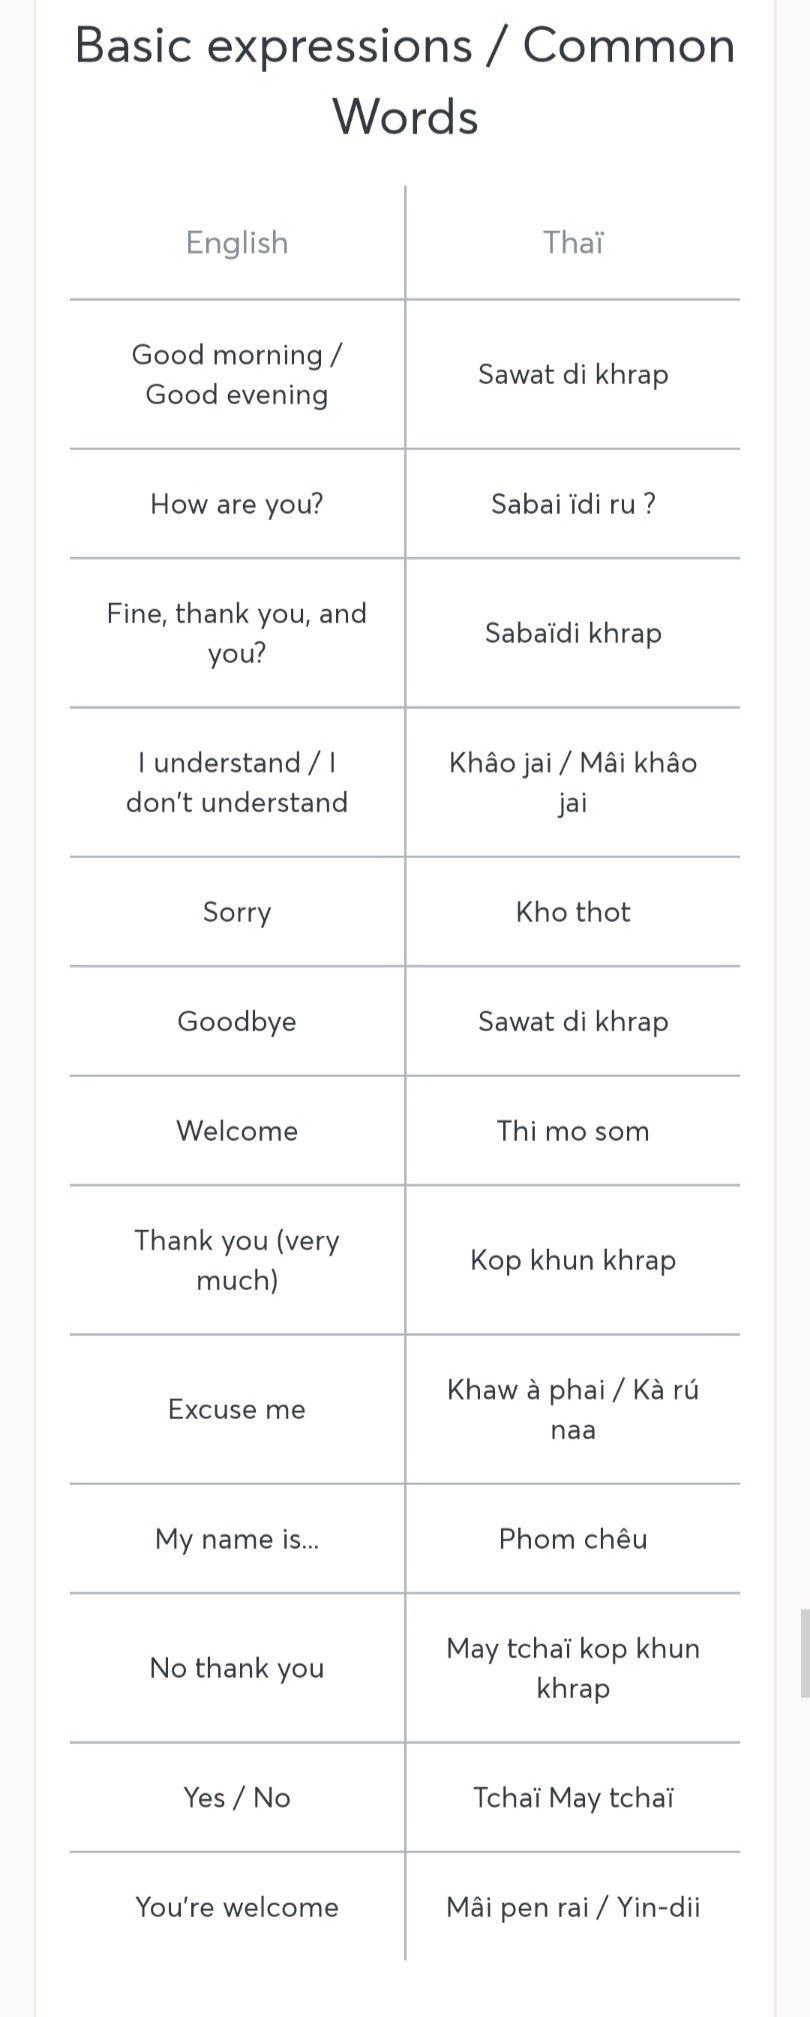 Pin Oleh Navin Sahay Di Travel Thai Phrases For Tourist Belajar Jenis Huruf Tulisan Bahasa